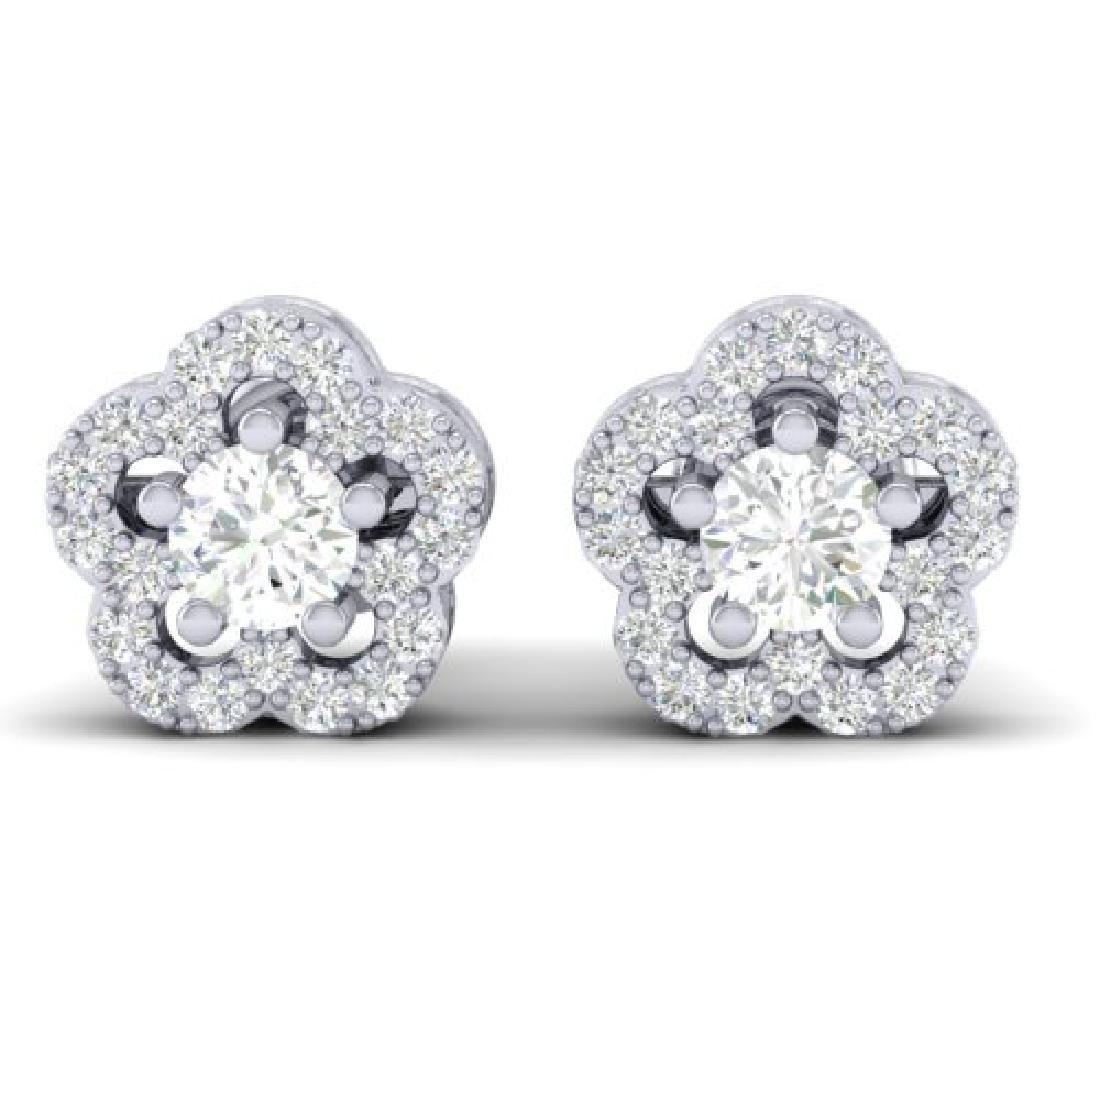 0.50 CTW Micro Pave VS/SI Diamond Earrings Moon Halo In